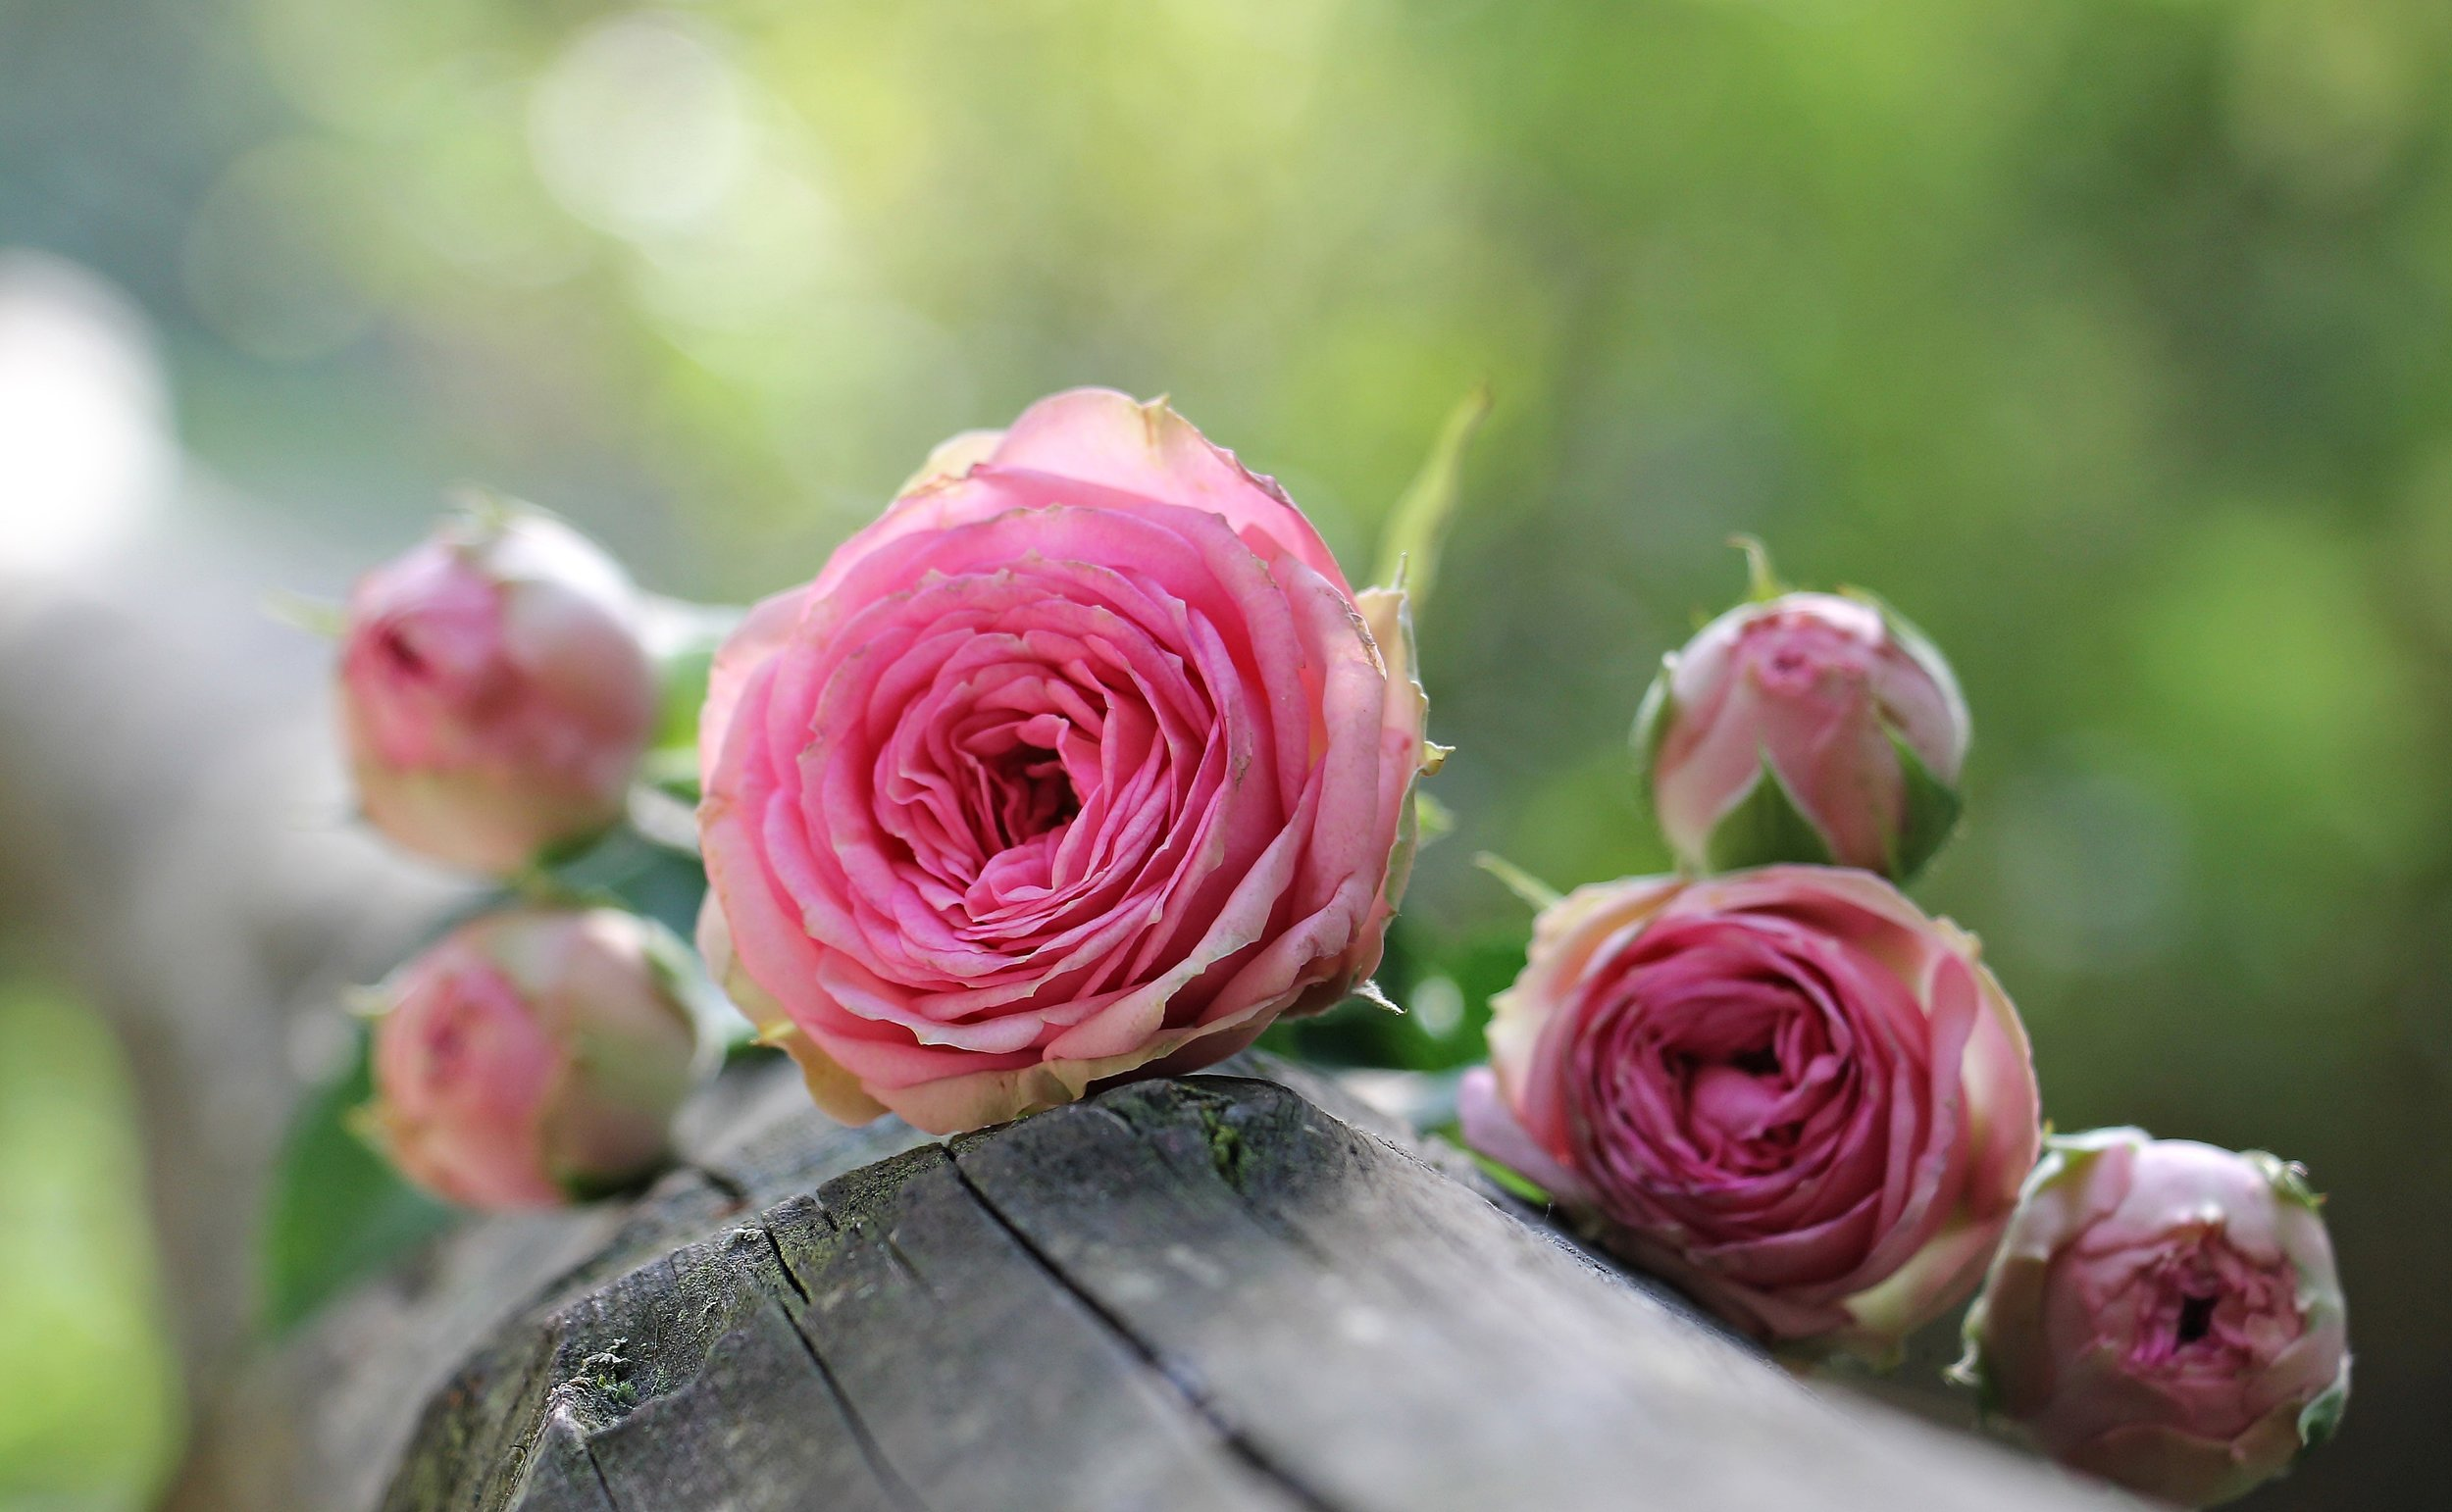 rose-1687884.jpg